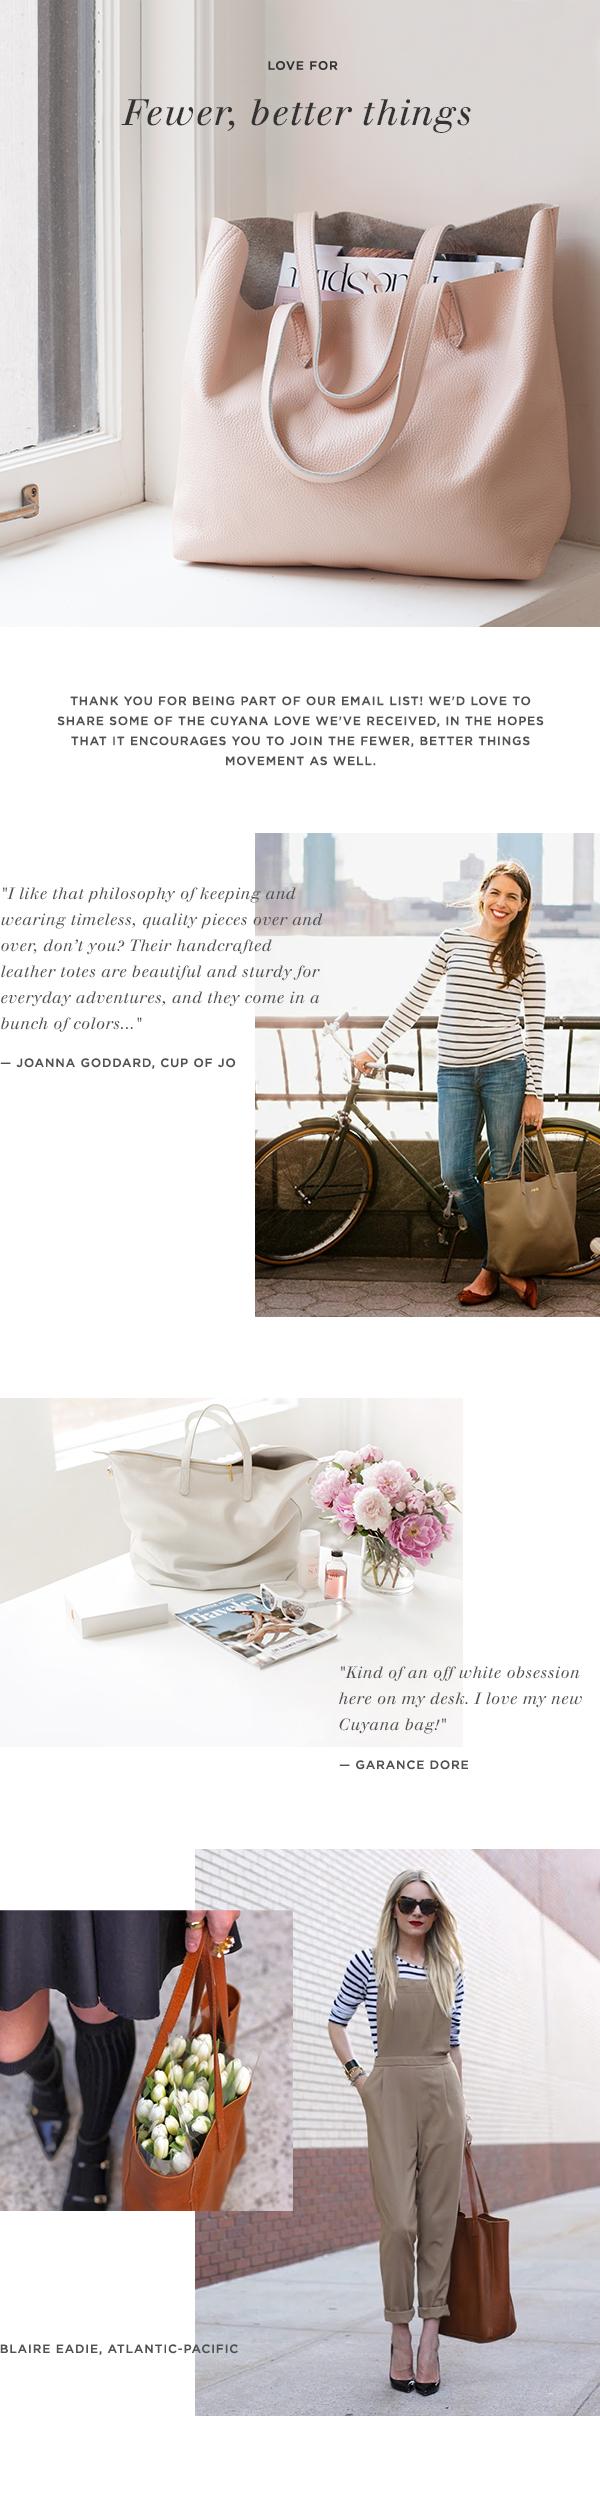 09_pressEmail_bloggers.jpg